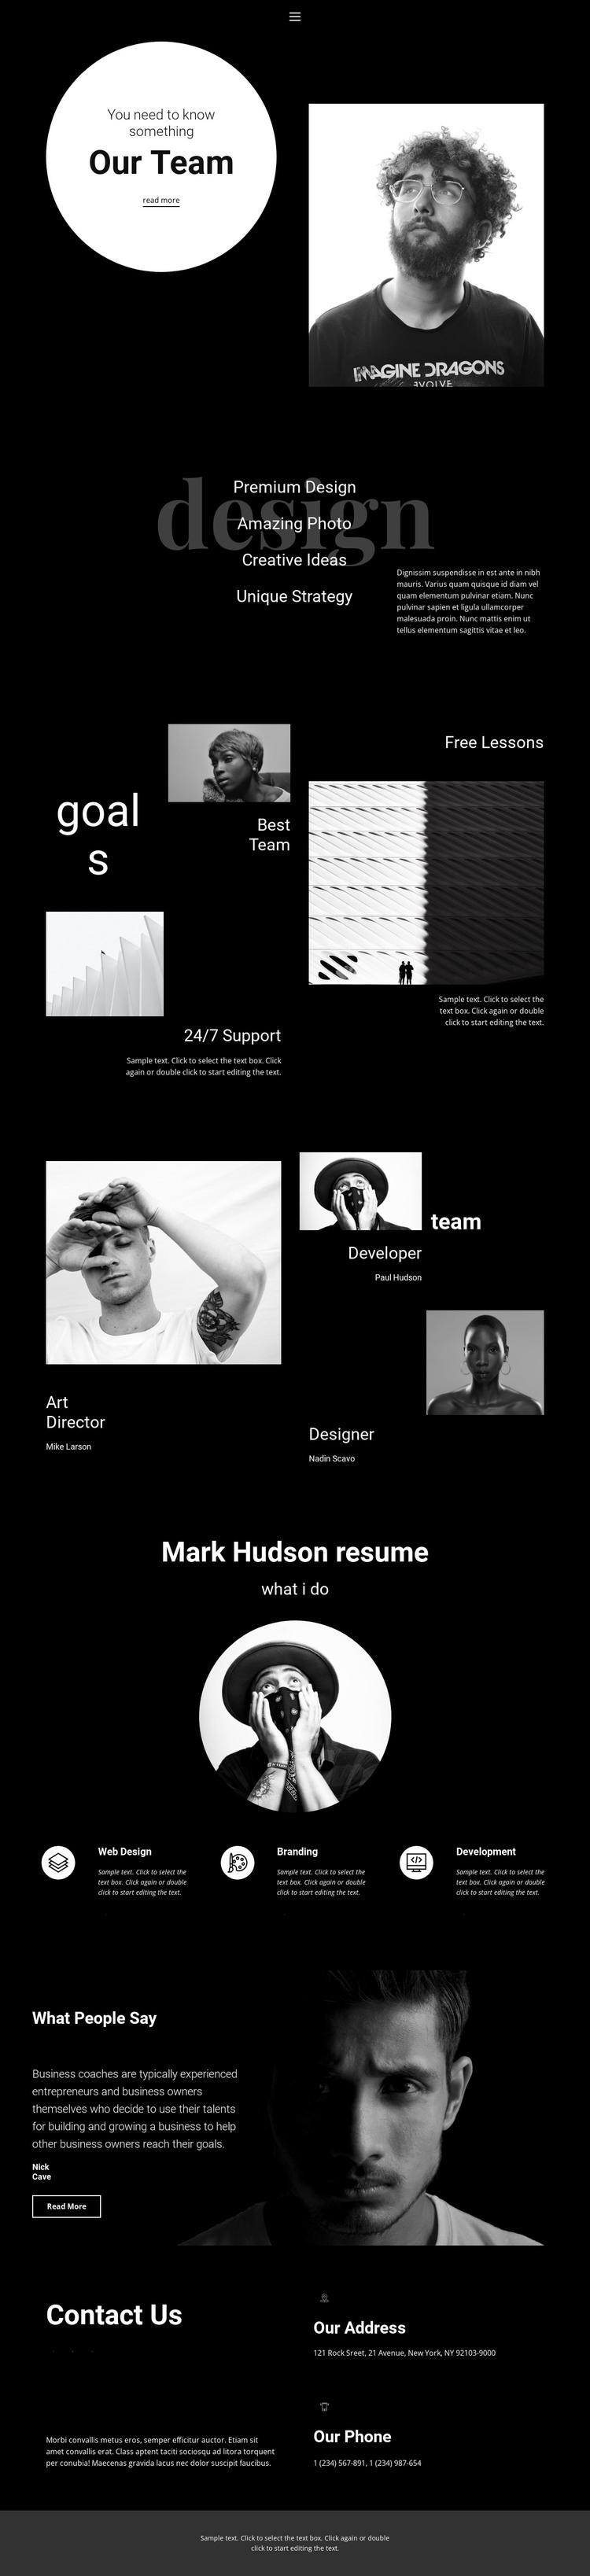 Design and development team WordPress Theme